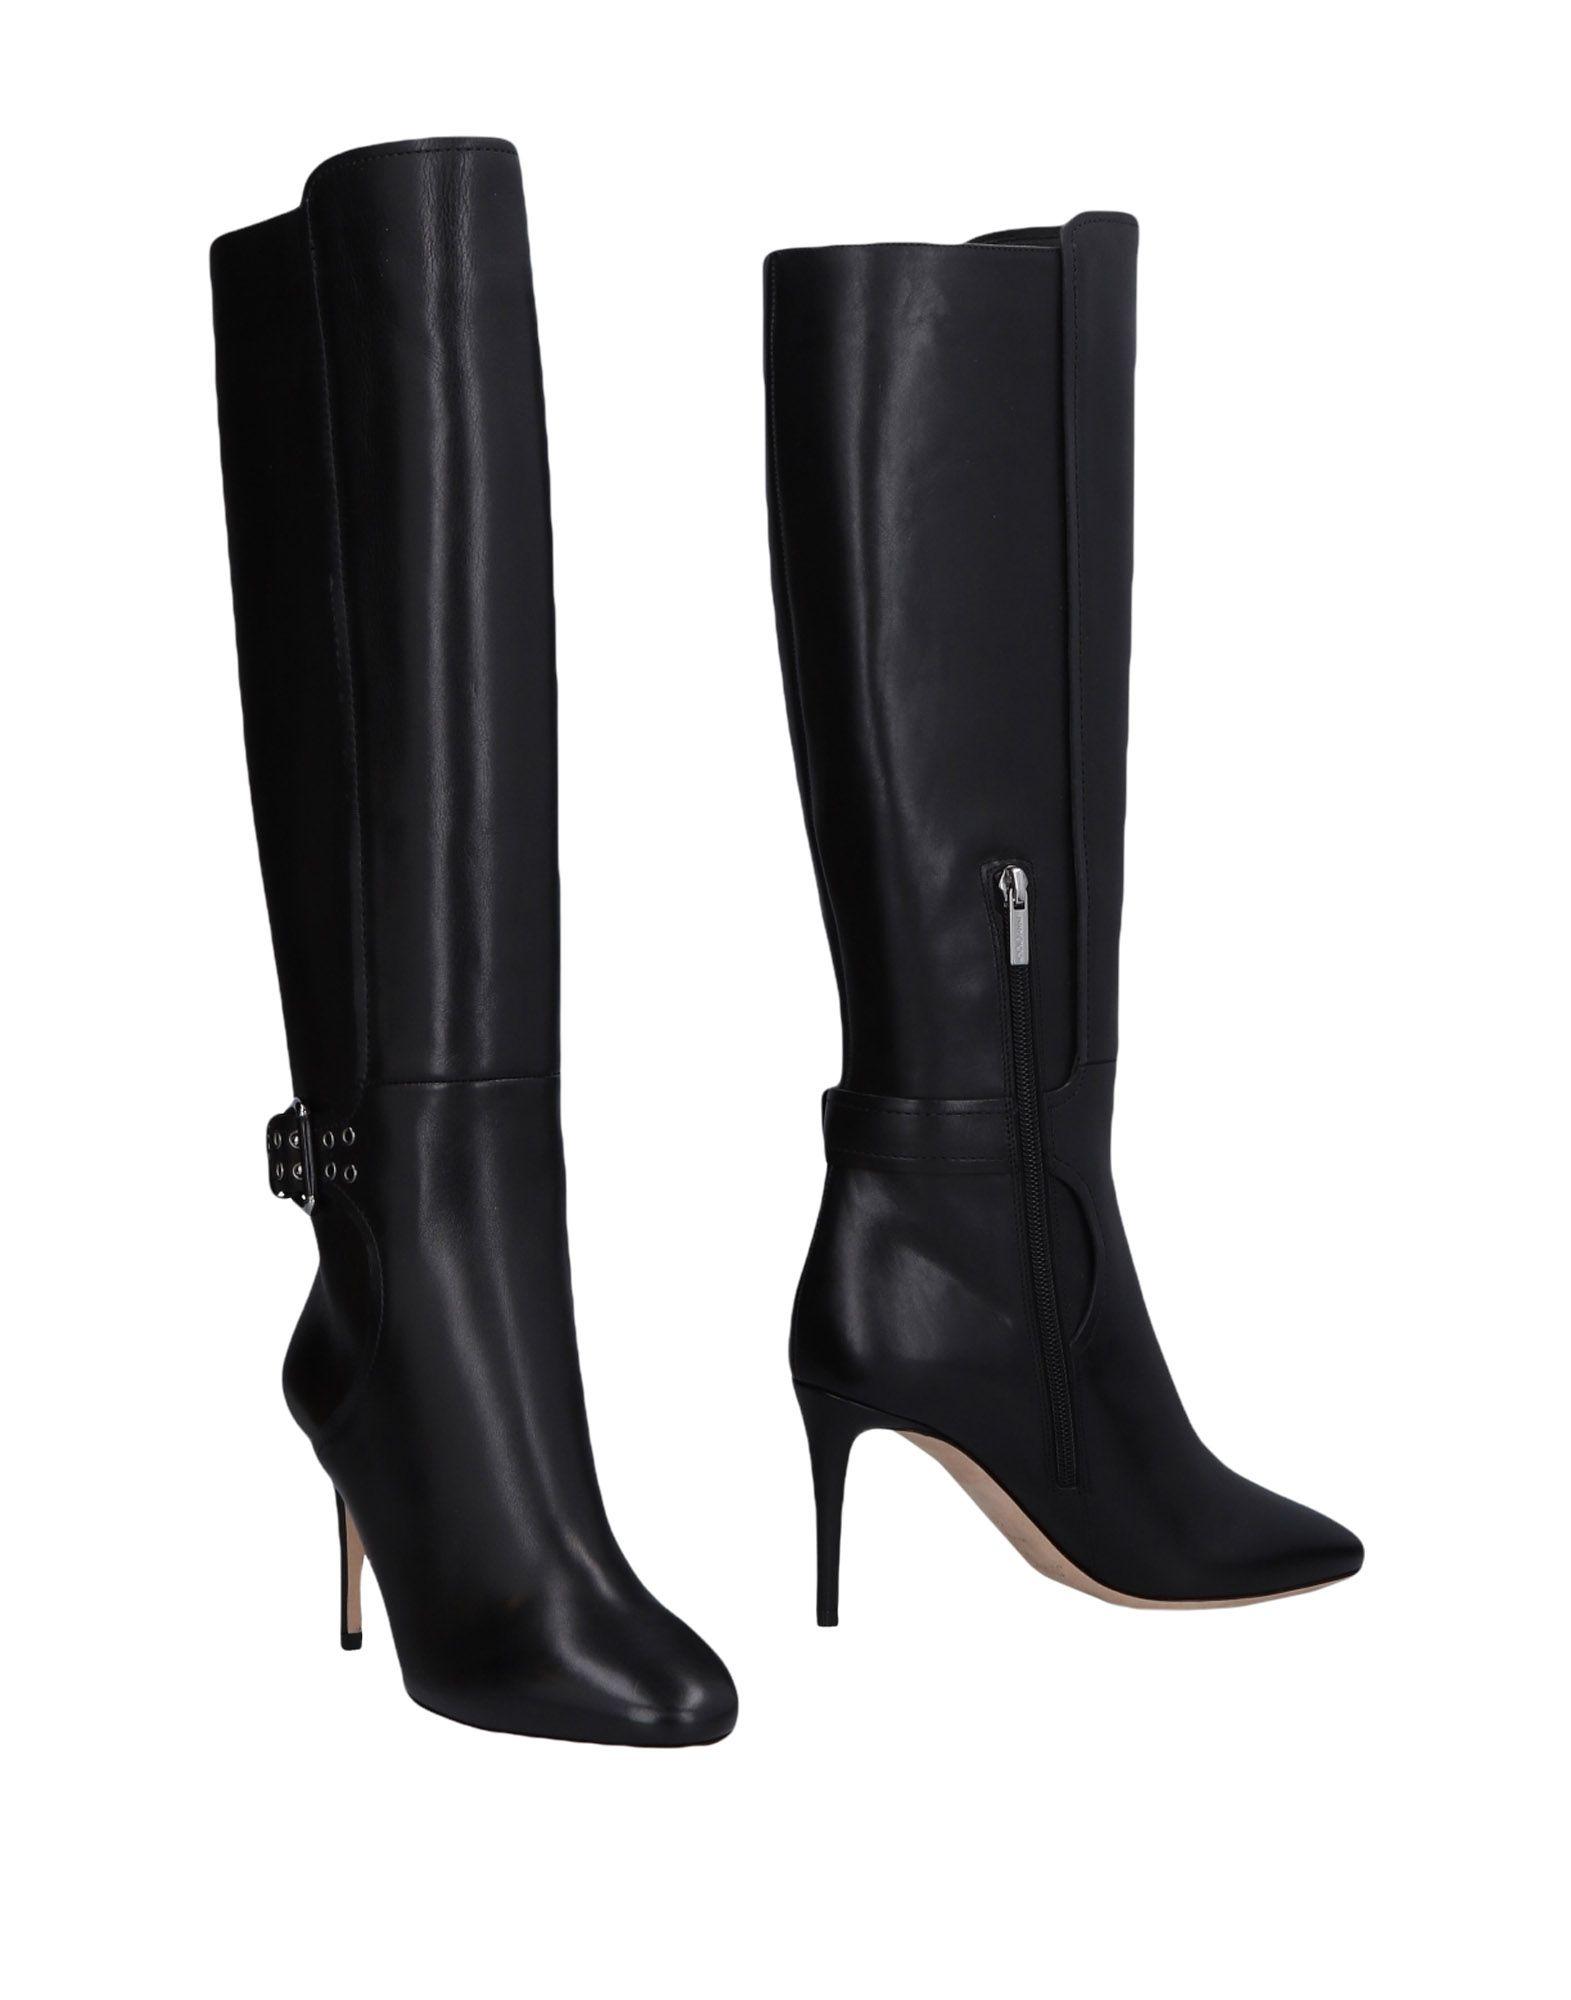 Jimmy Choo Boots - Women Jimmy Choo United Boots online on  United Choo Kingdom - 11475377PI a27b0e